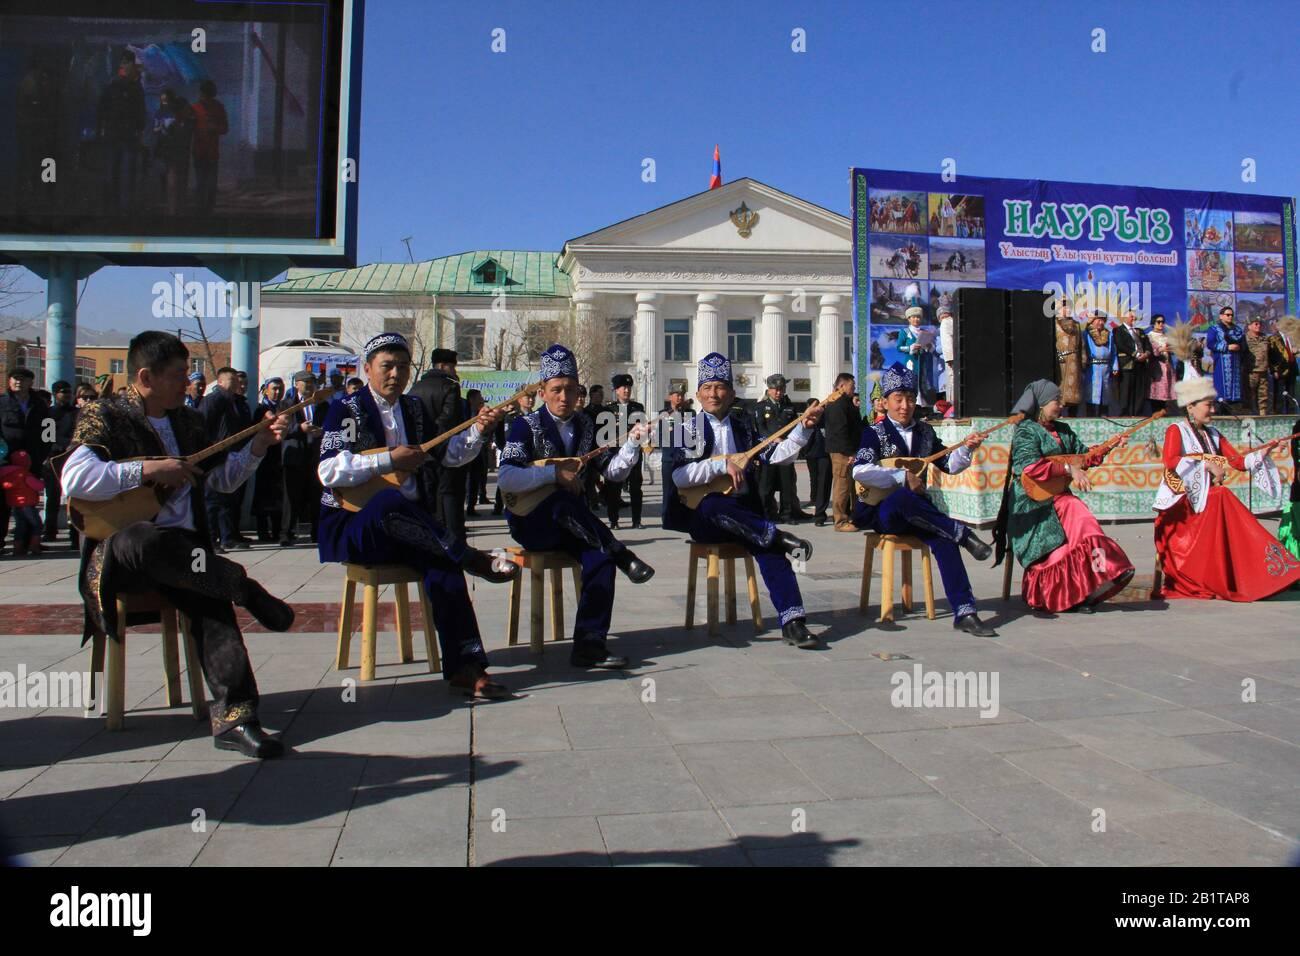 Festival de Nauryz en la provincia de Bayan Ulgii en Mongolia Occidental. Festival tradicional de nómadas kazakos Foto de stock